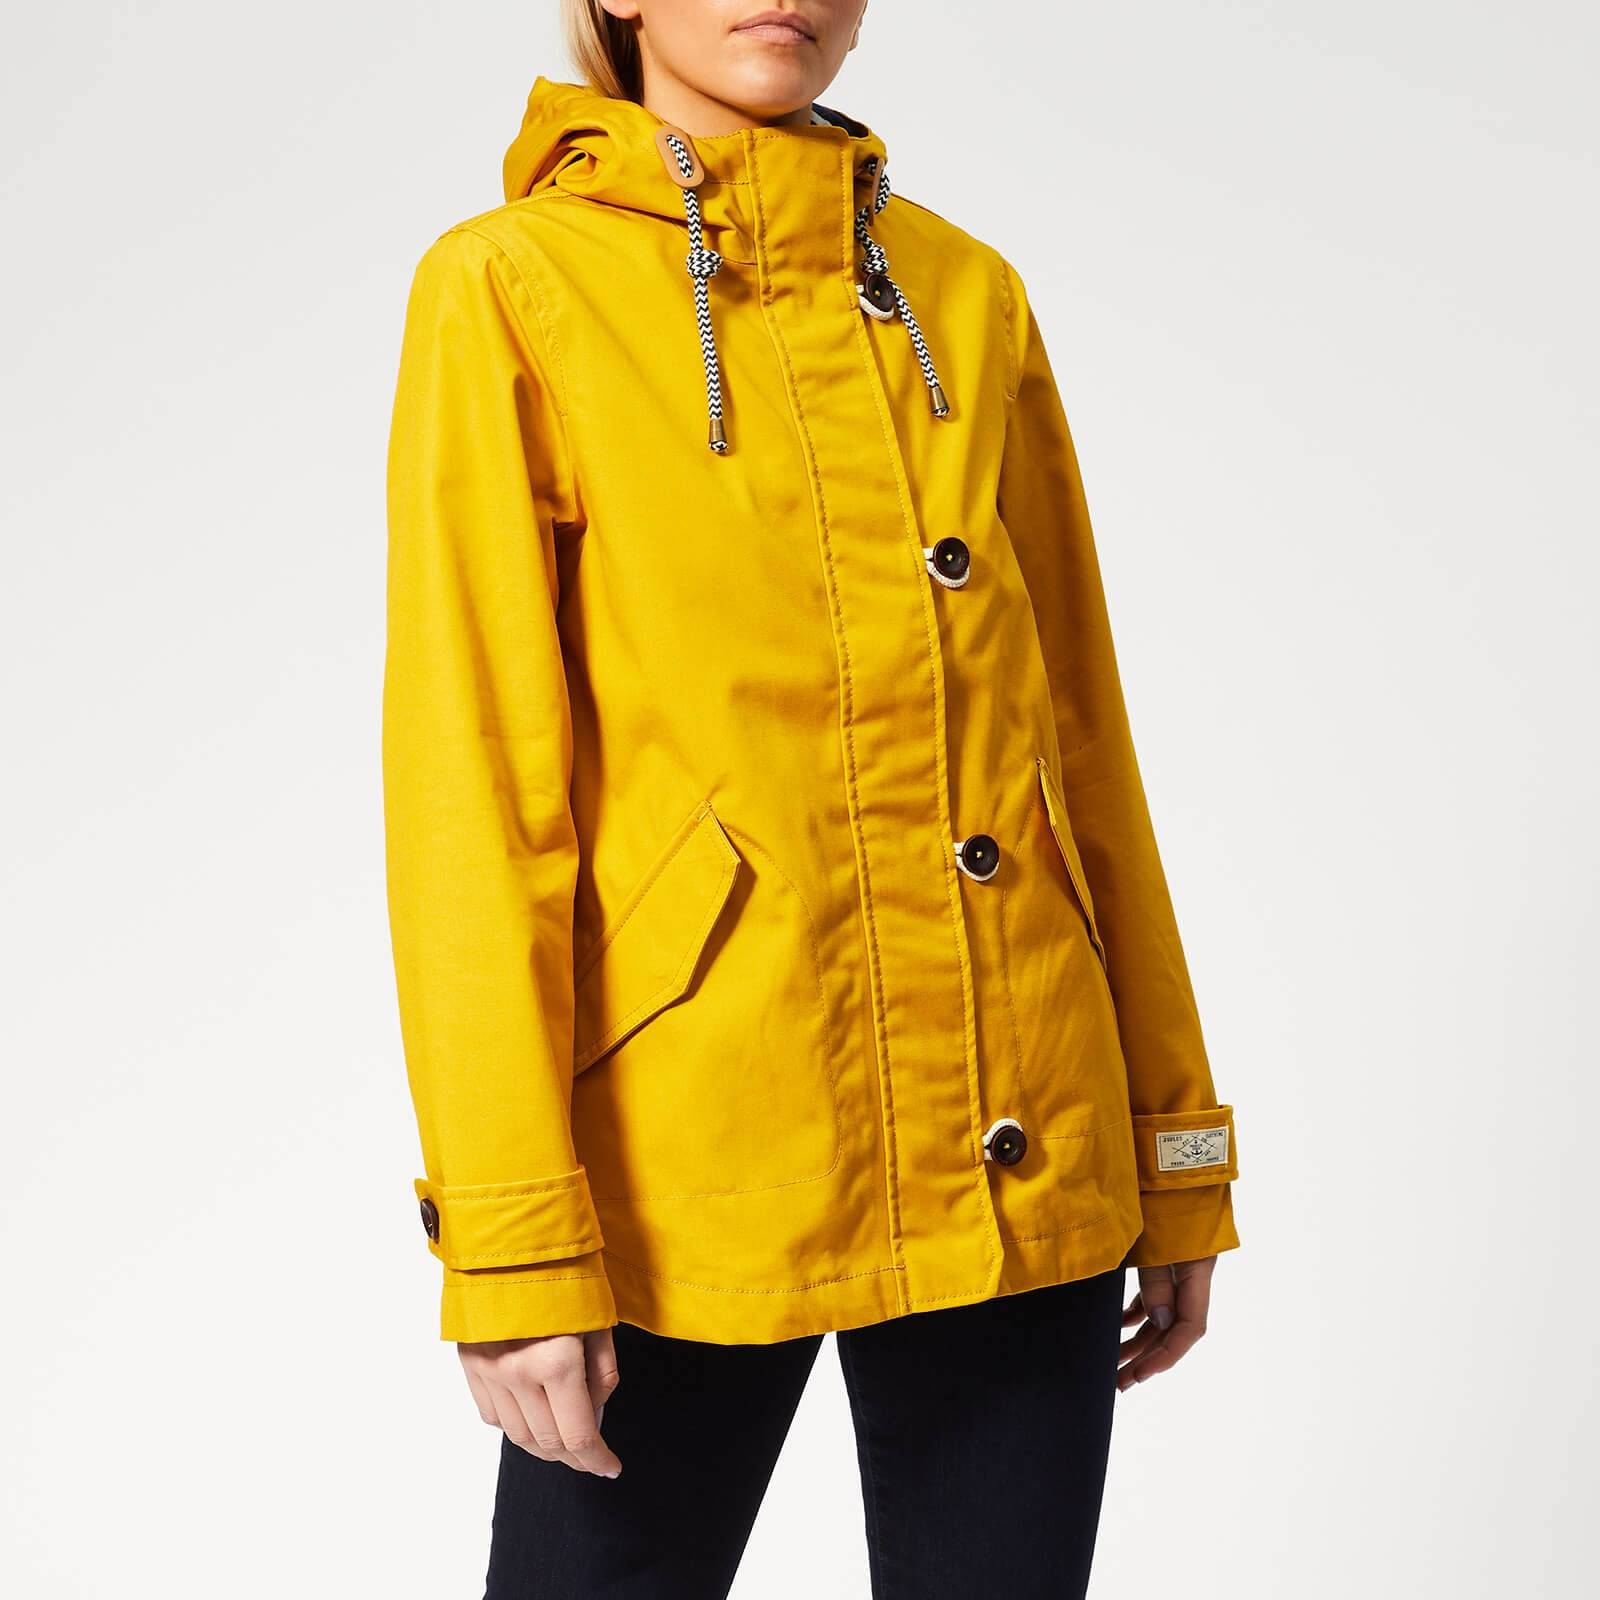 Joules Women's Coast Waterproof Jacket - Antique Gold - UK 14